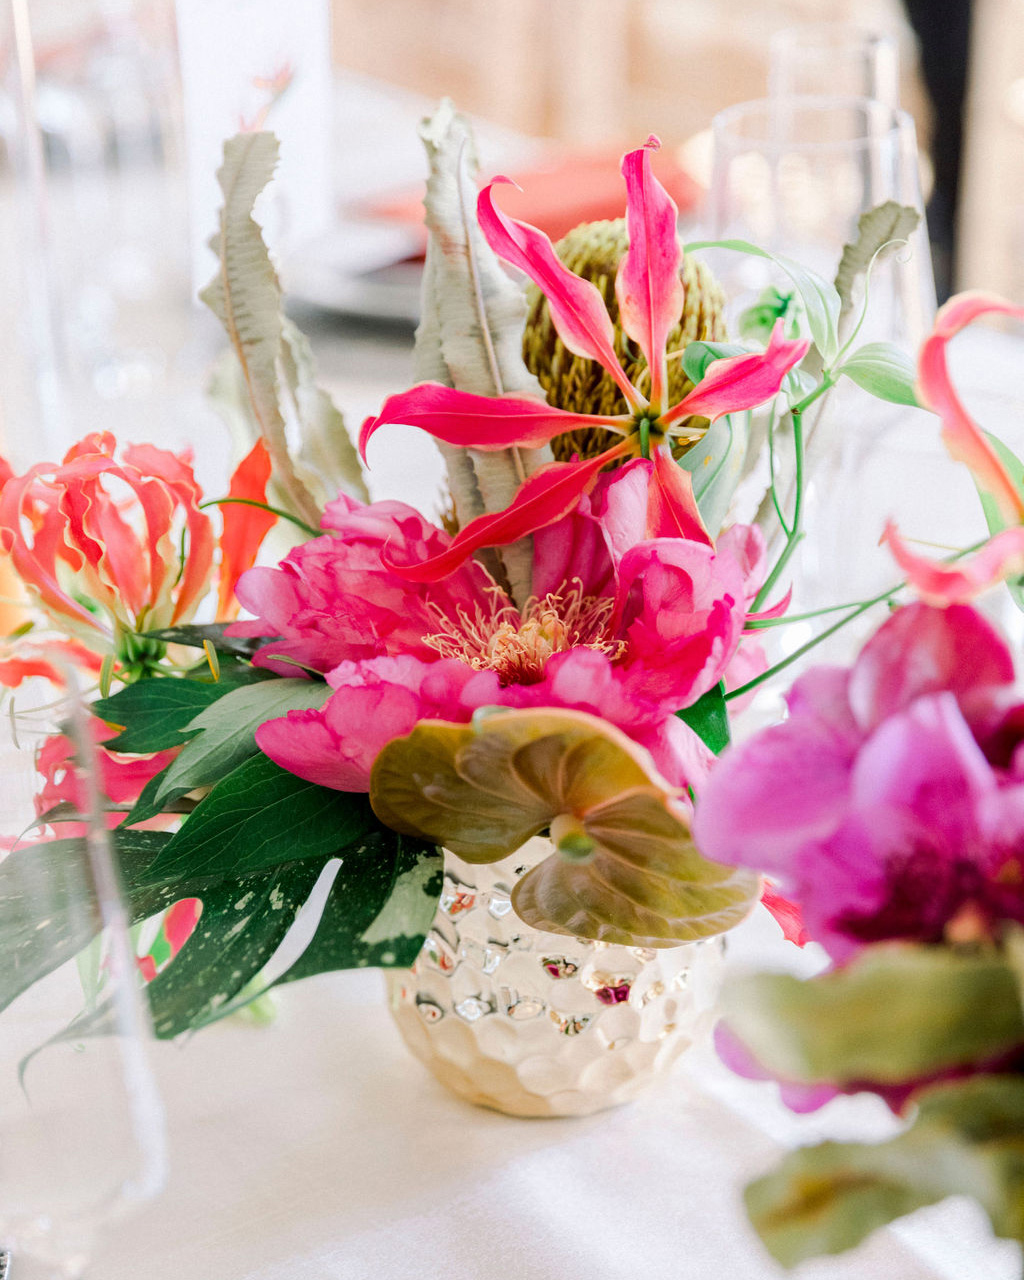 dalila elliot tropical flowers centerpiece